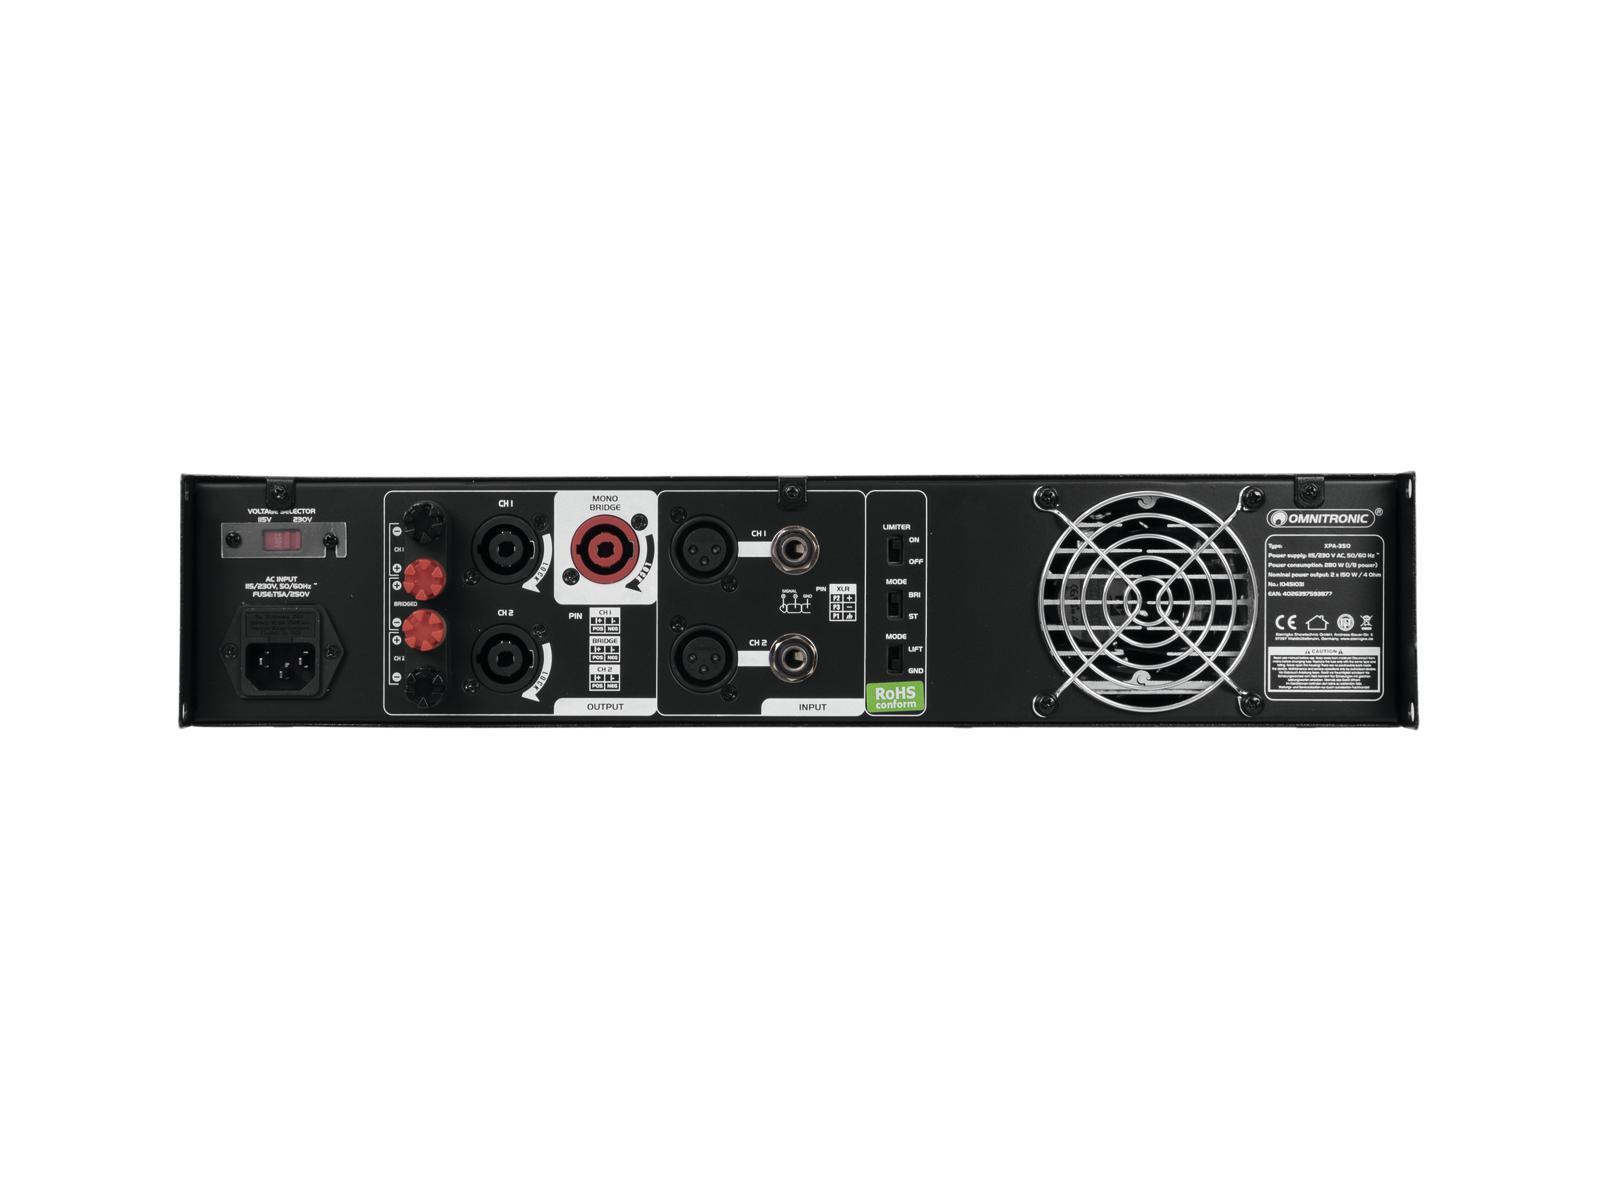 OMNITRONIC XPA-350 Endstufe